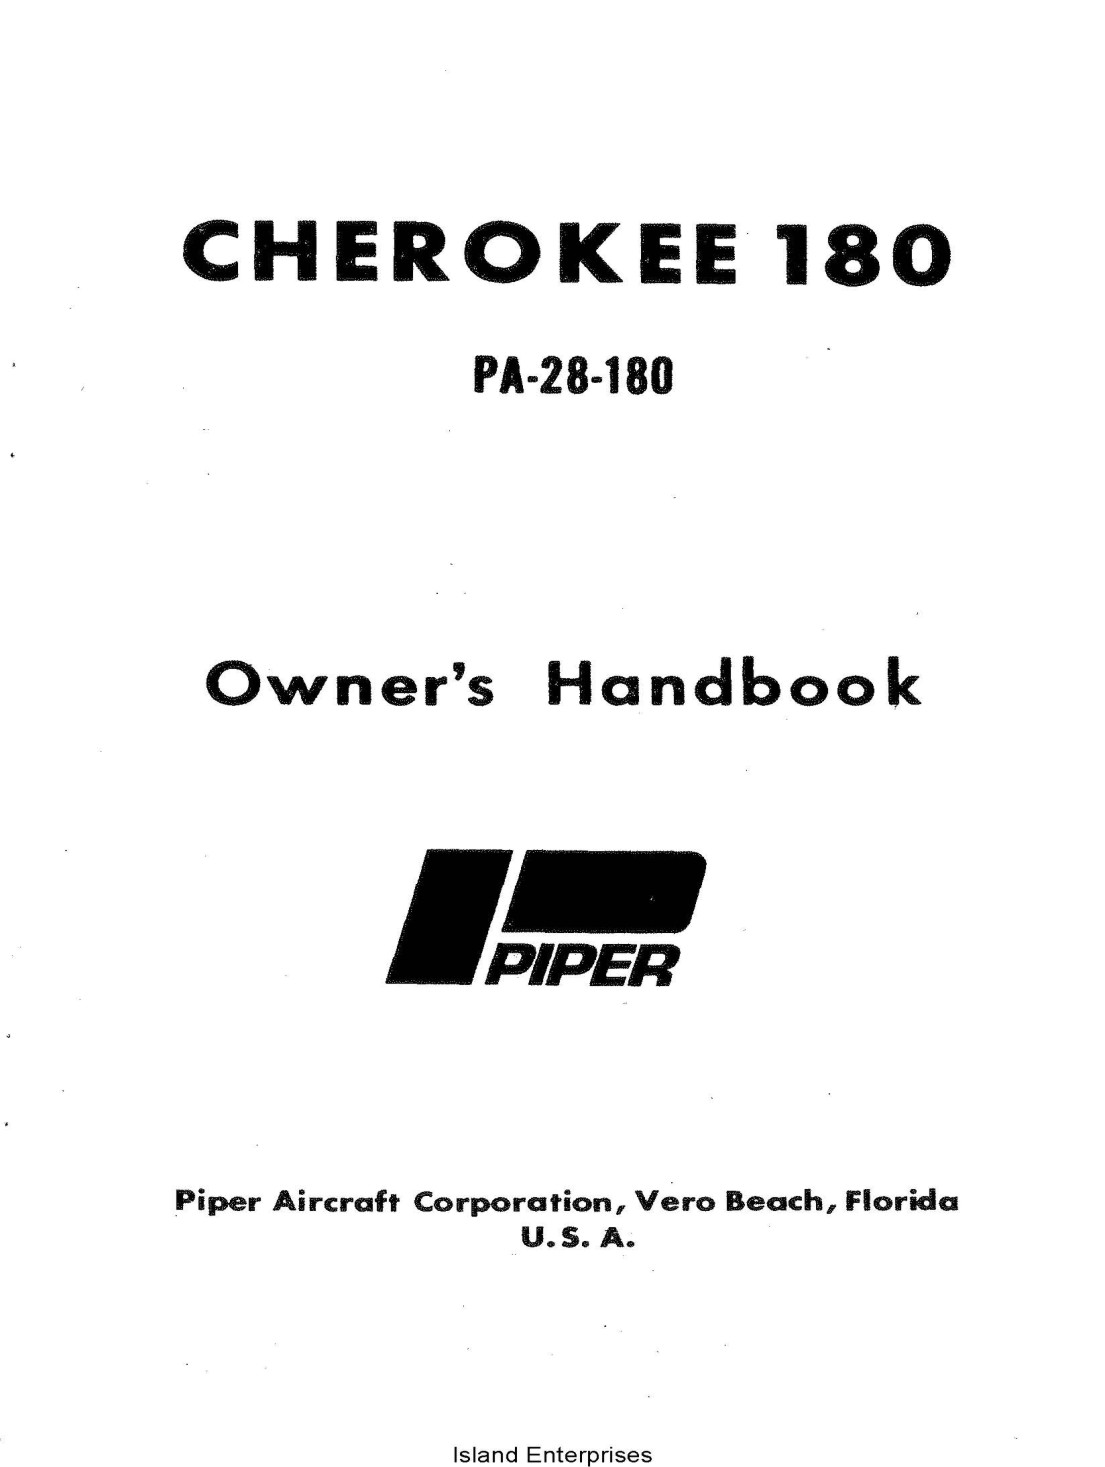 Piper Cherokee 180 PA-28-180 Owner's Handbook 761-513